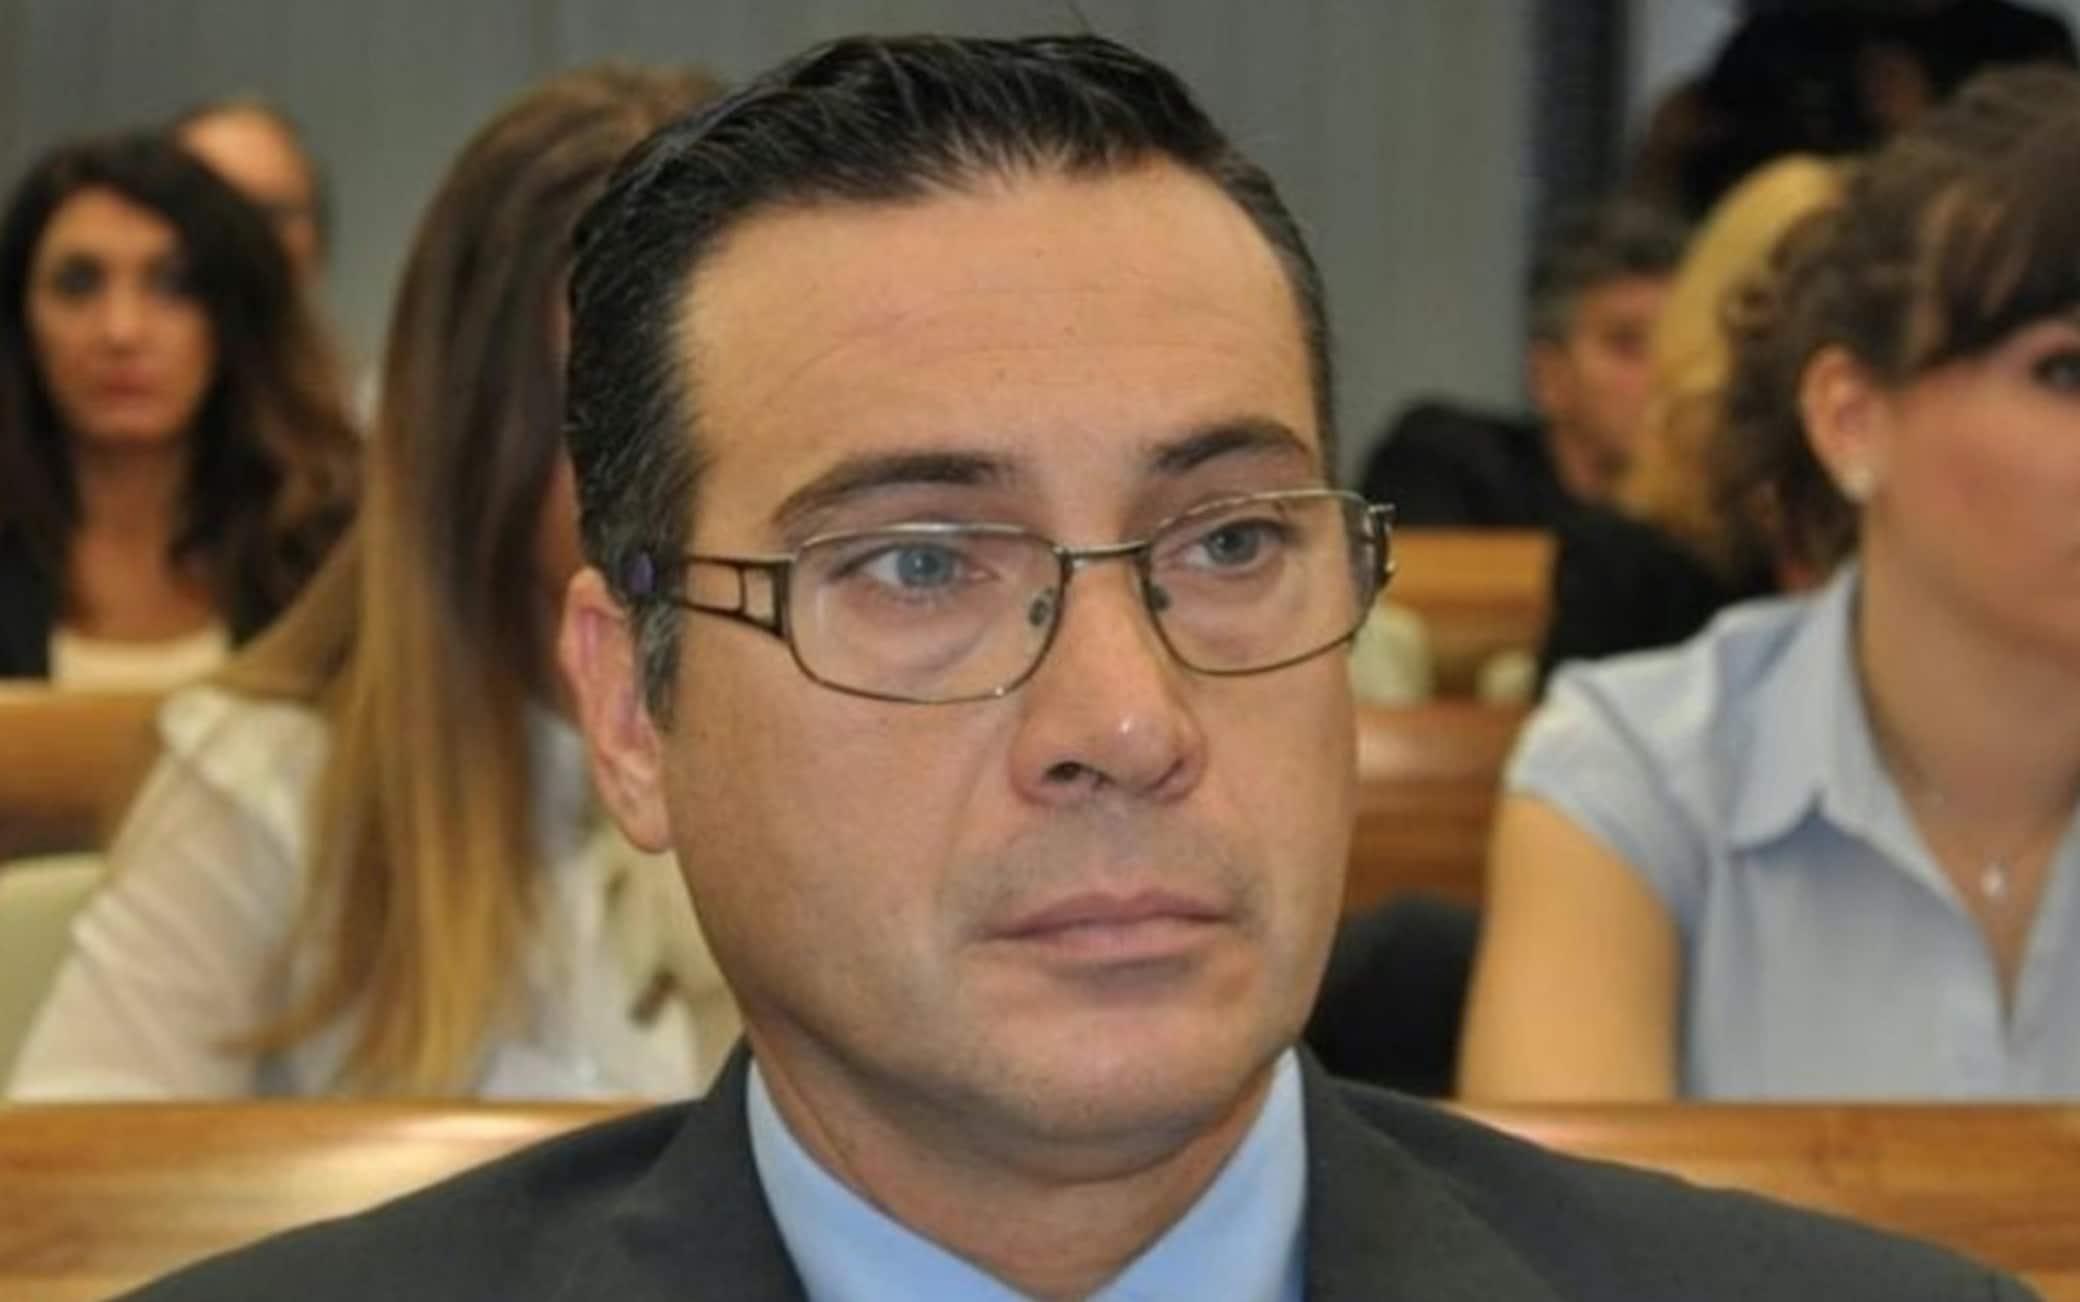 Walter Biot